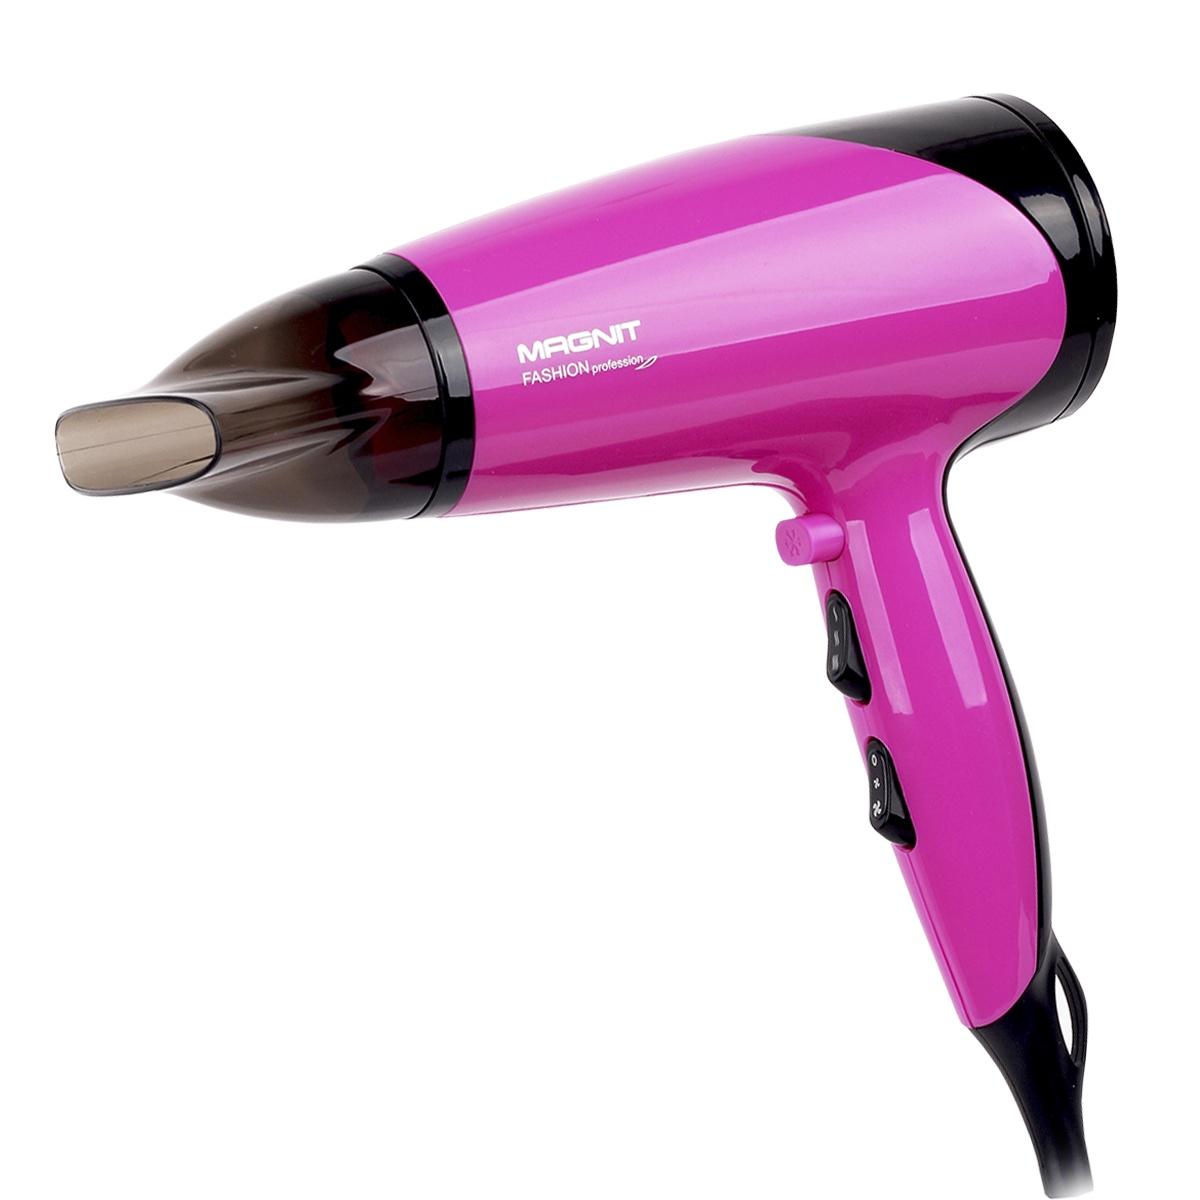 Фен для волос Magnit, 2200 Вт, насадка концентратор цена 2017